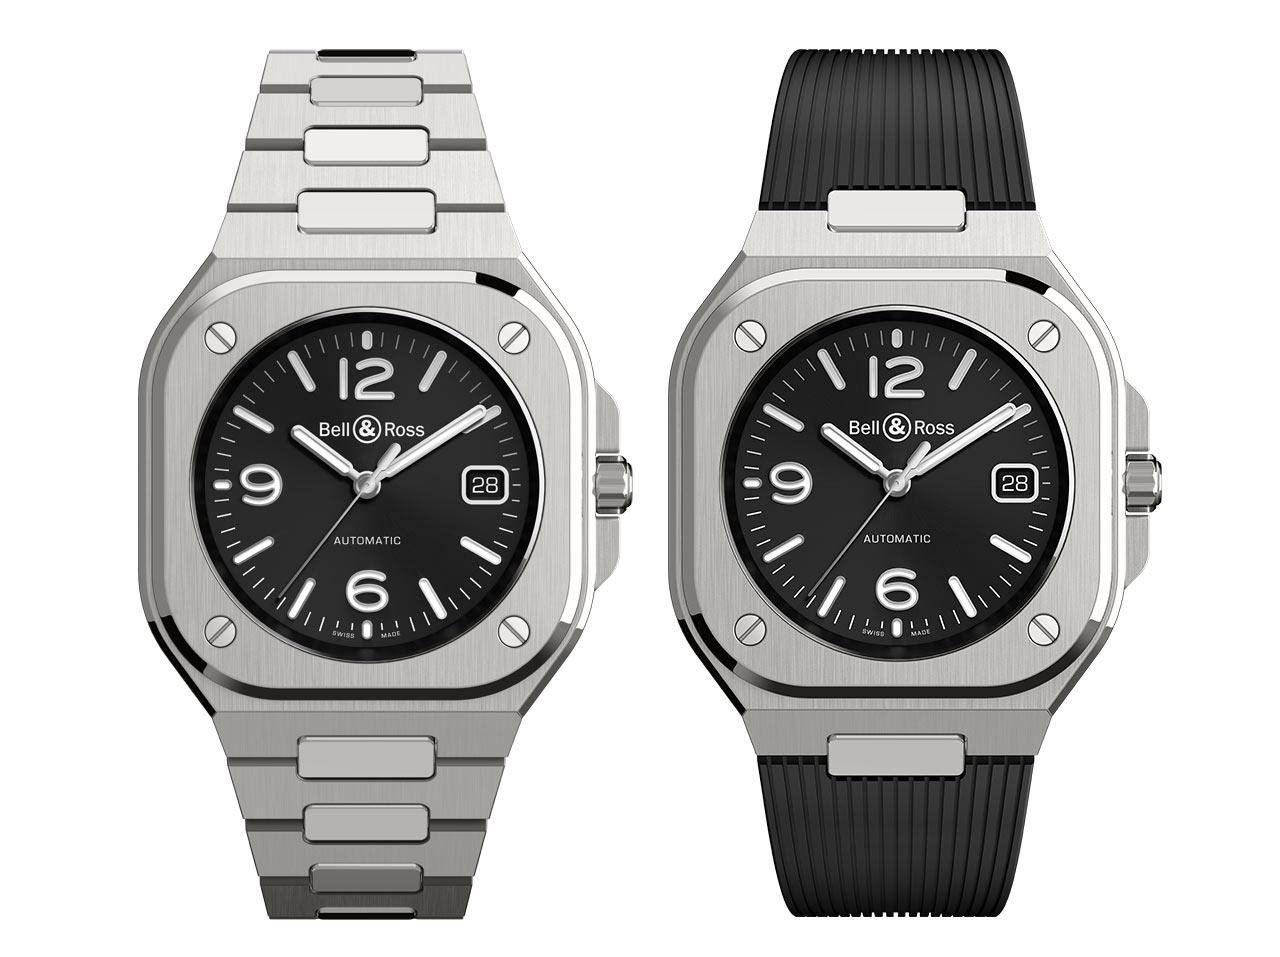 BellRoss-BR05-Black-Steel-001-1.jpg